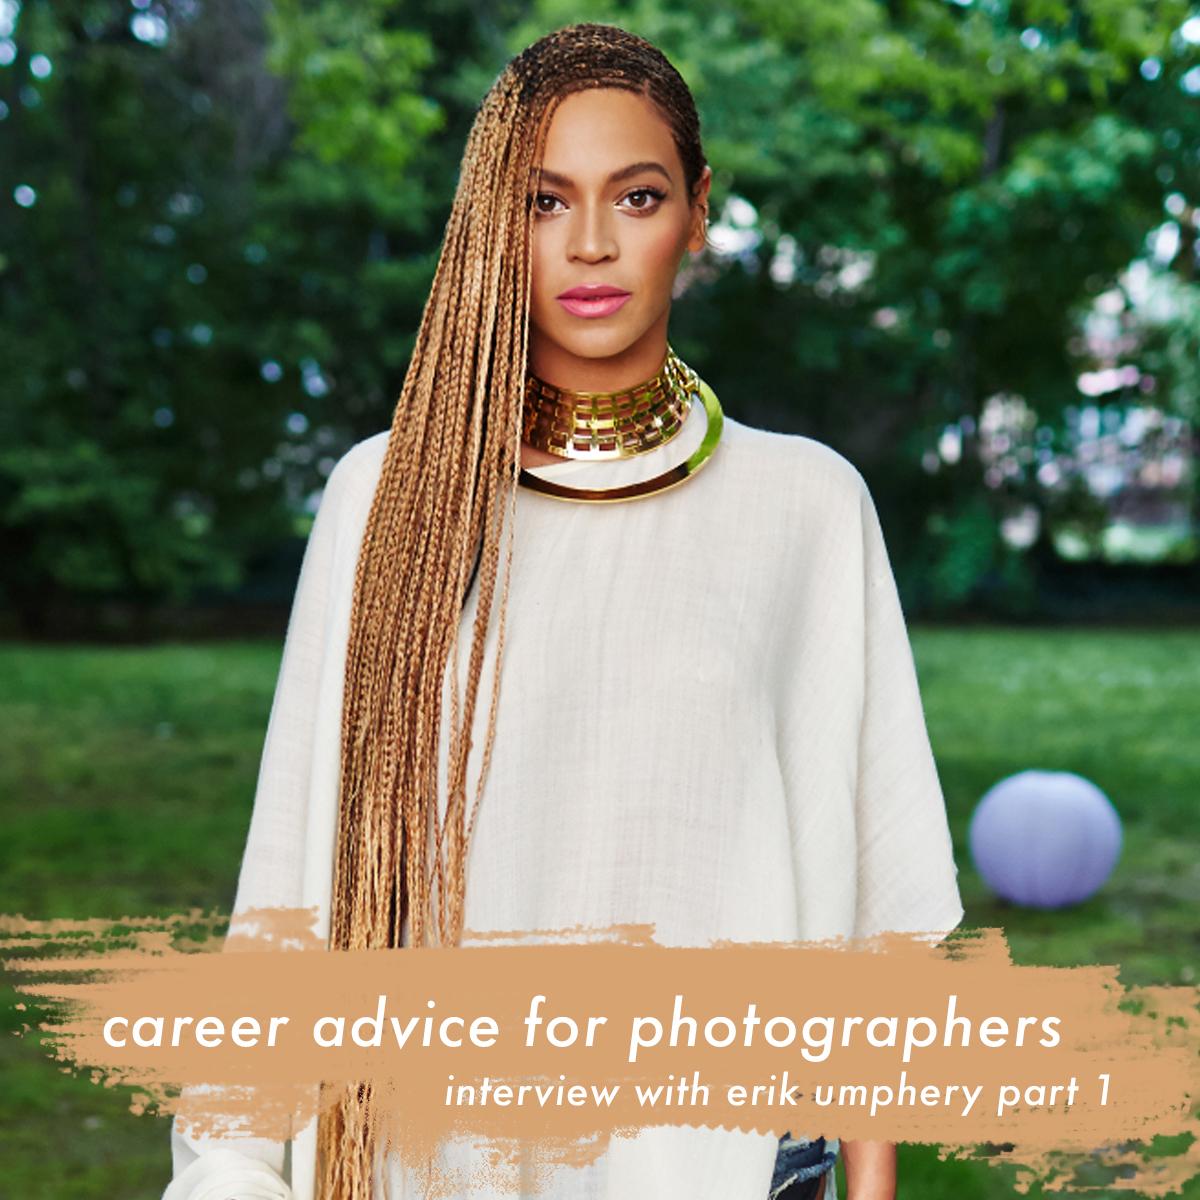 career-advice-for-photographers-erik-umphery-part1.jpg